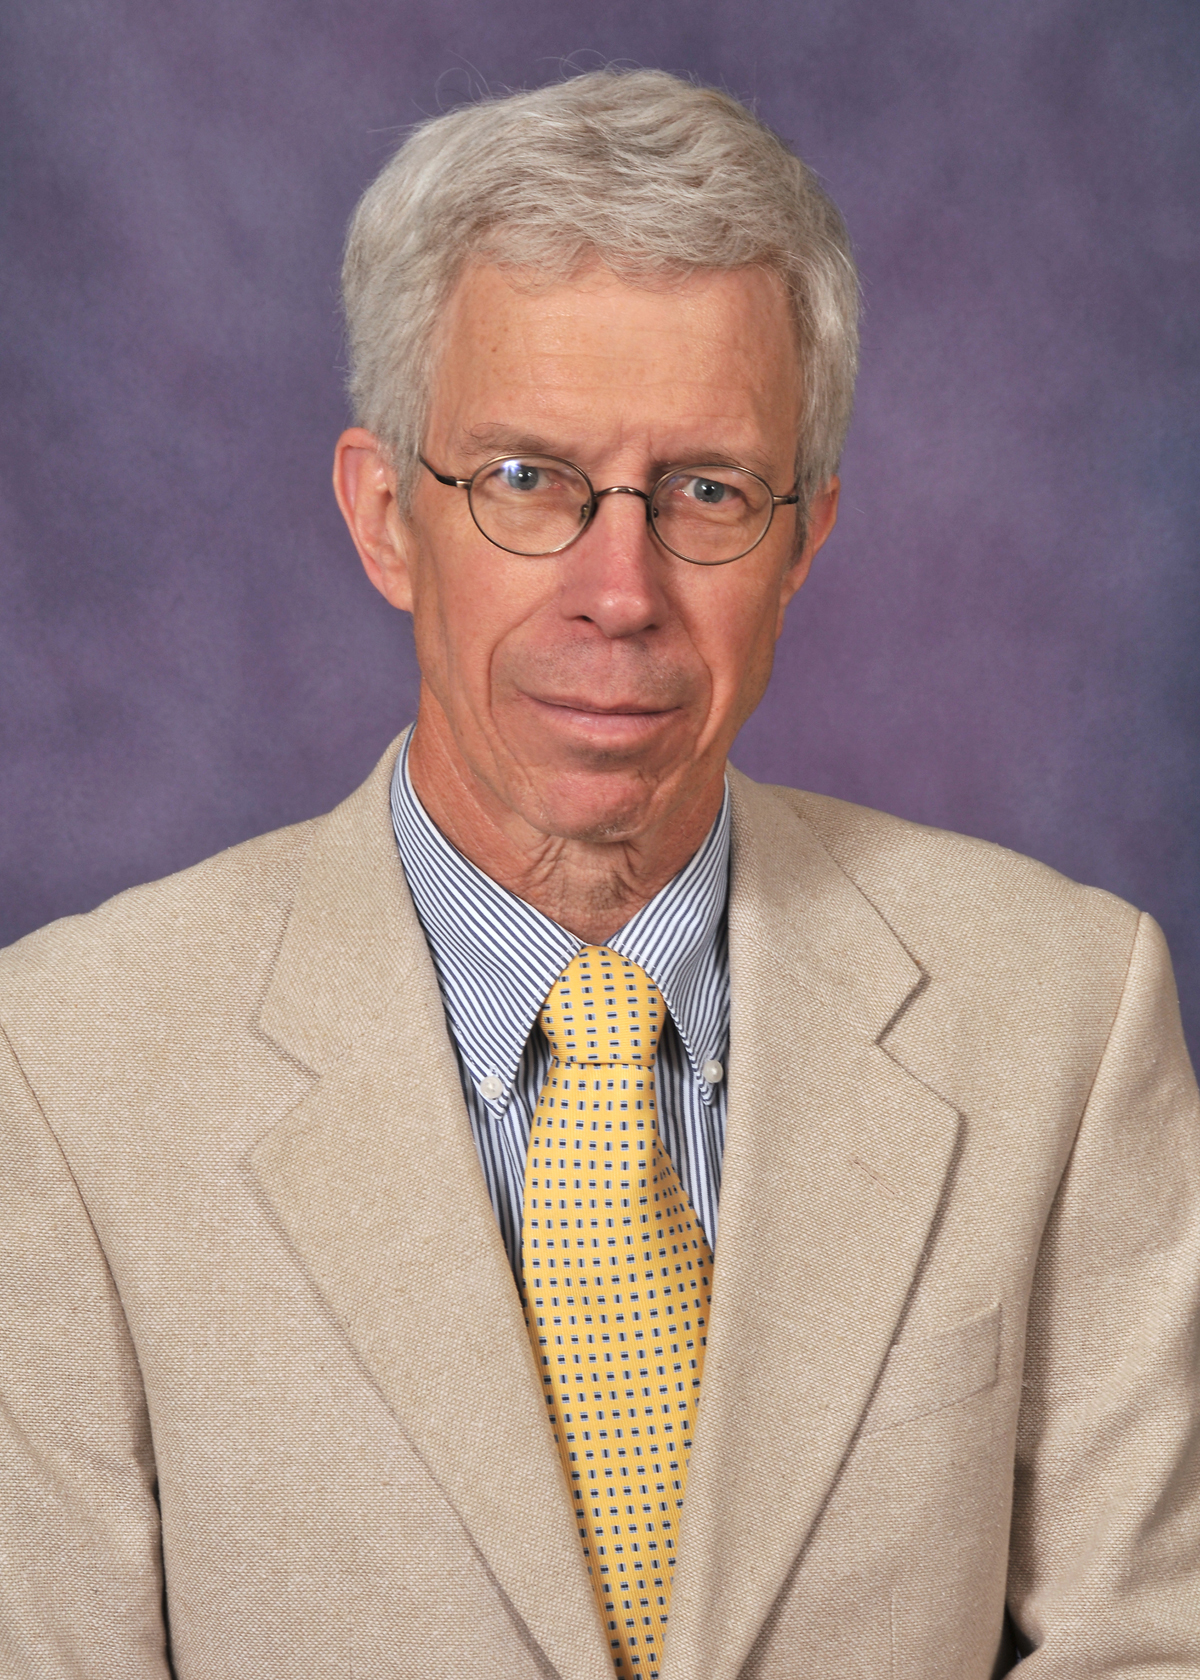 Biography wayne law wayne state university for Steve calkins